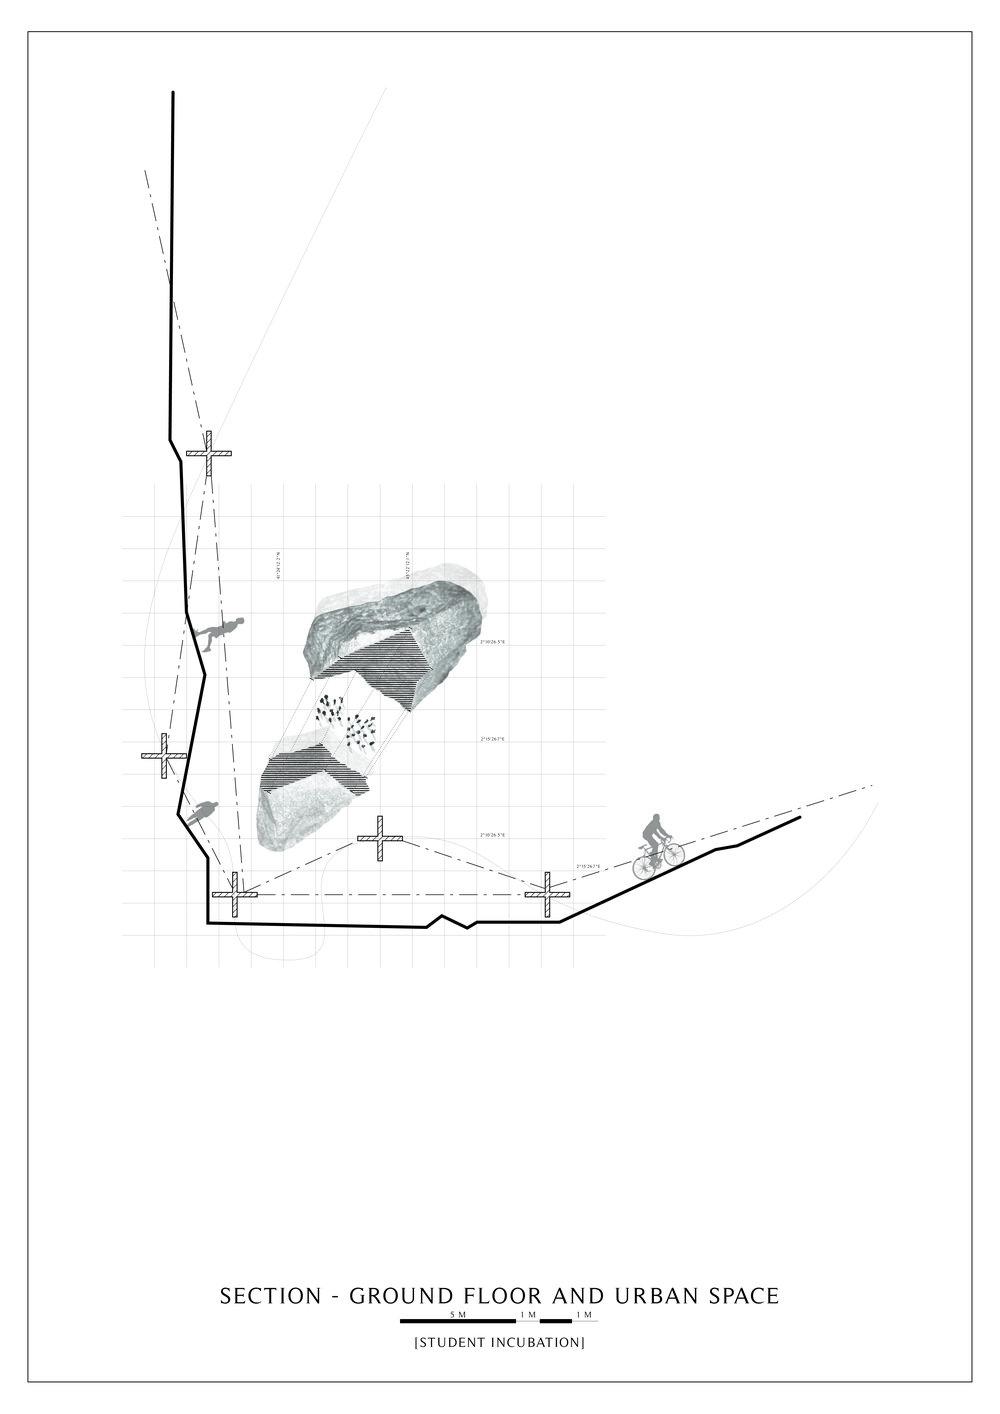 008a-fracture-series.jpg